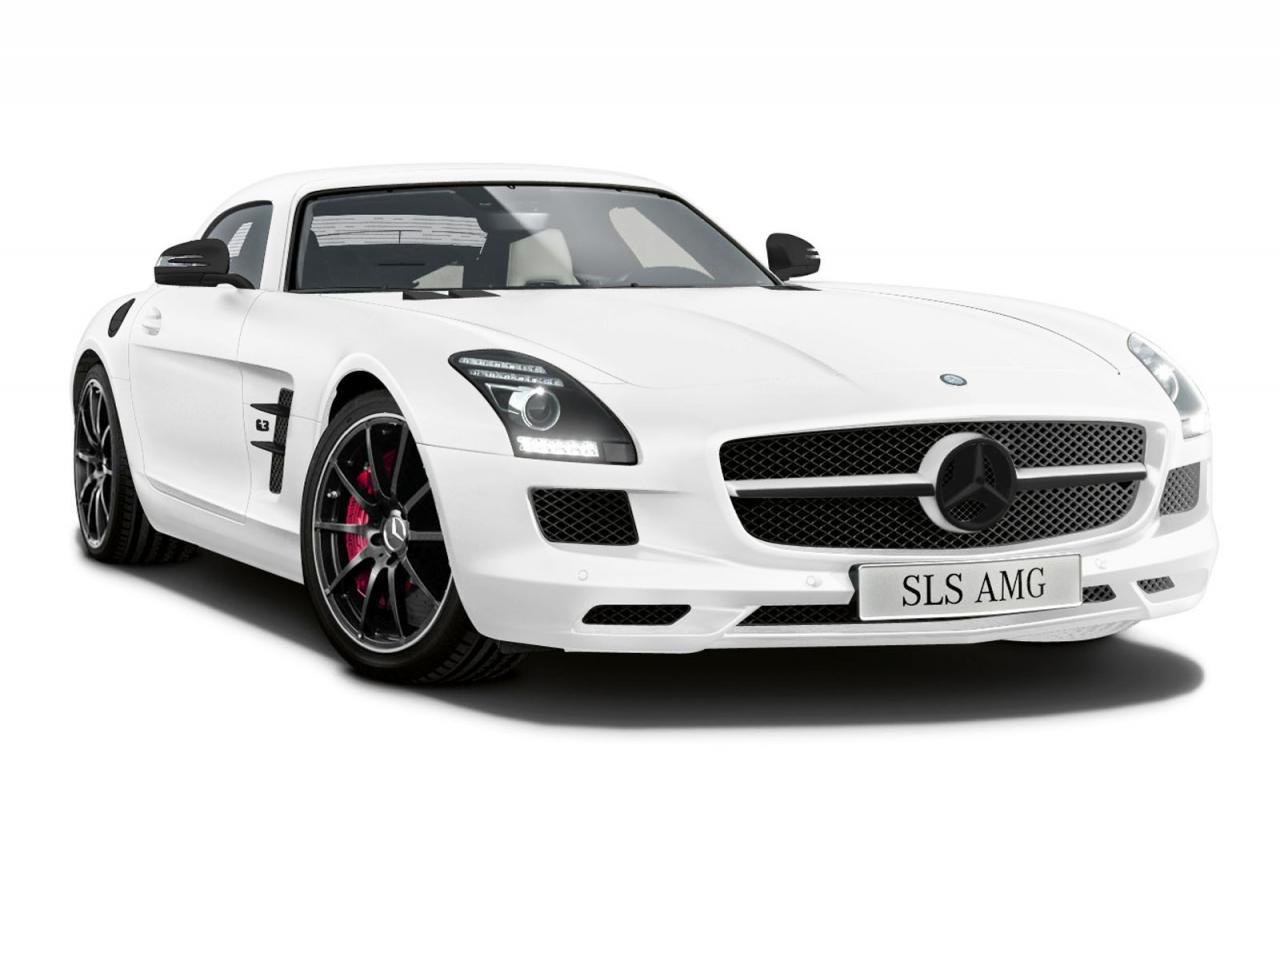 2012 mercedes benz sls amg matt limited edition for Mercedes benz limited edition